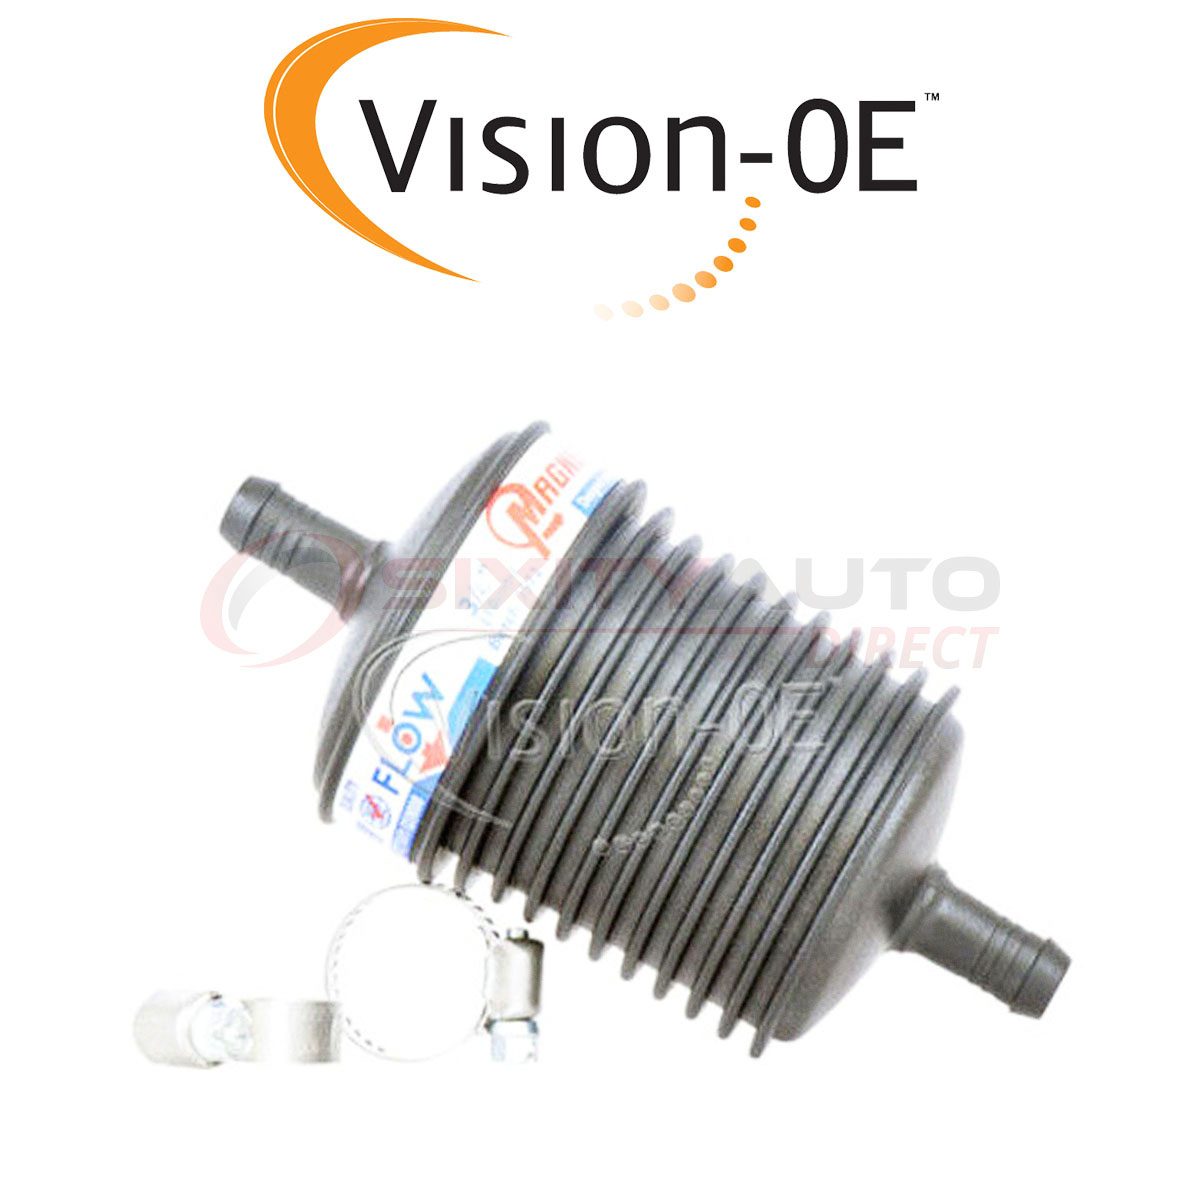 Vision OE Power Steering Pump for 2000-2008 Honda Accord 2